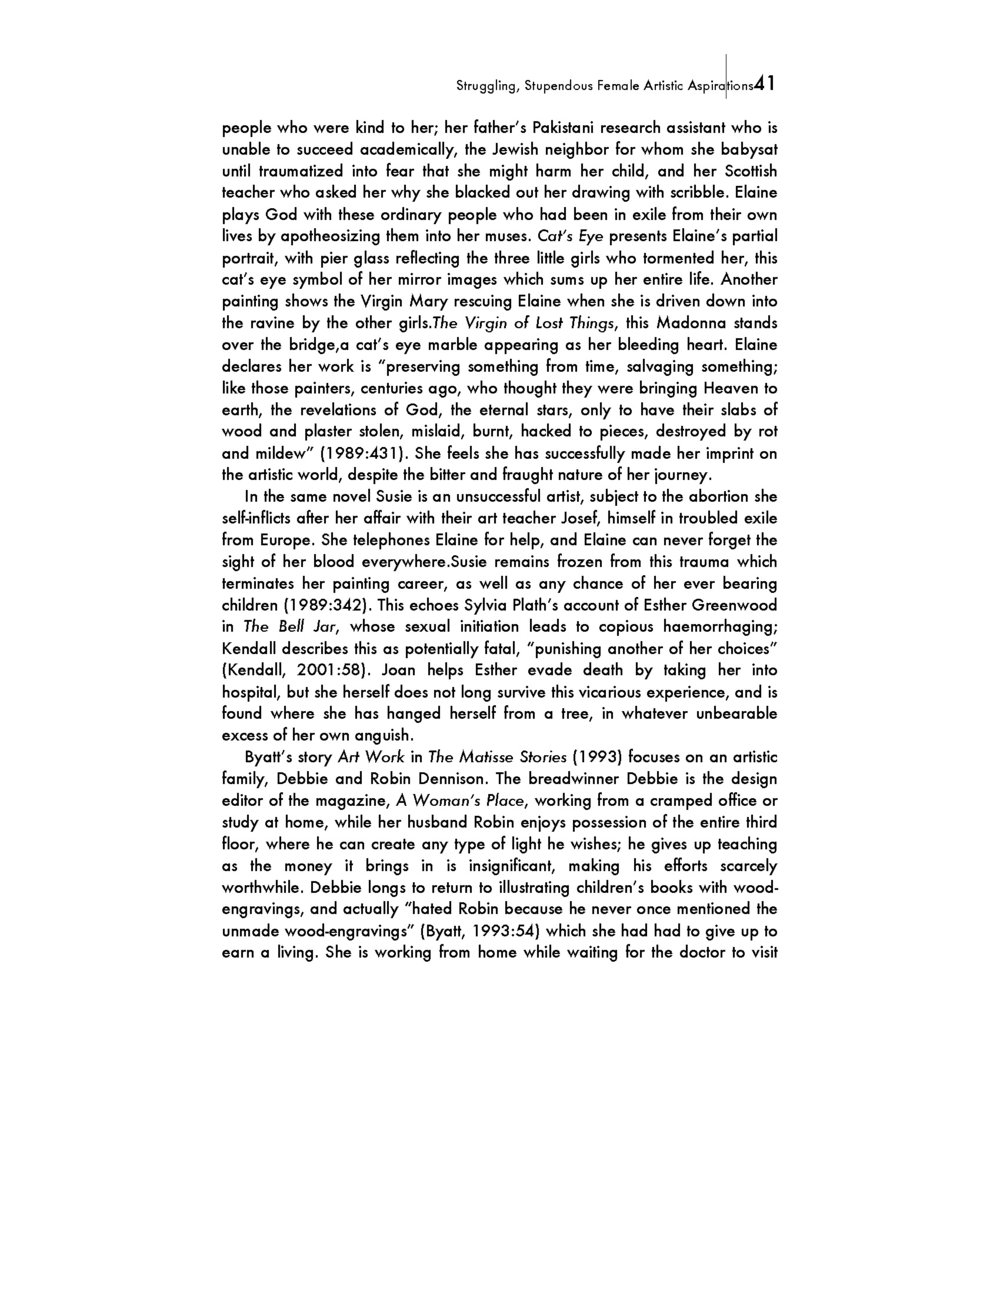 StrugglingStupendousFemalep31_Page_11.jpg